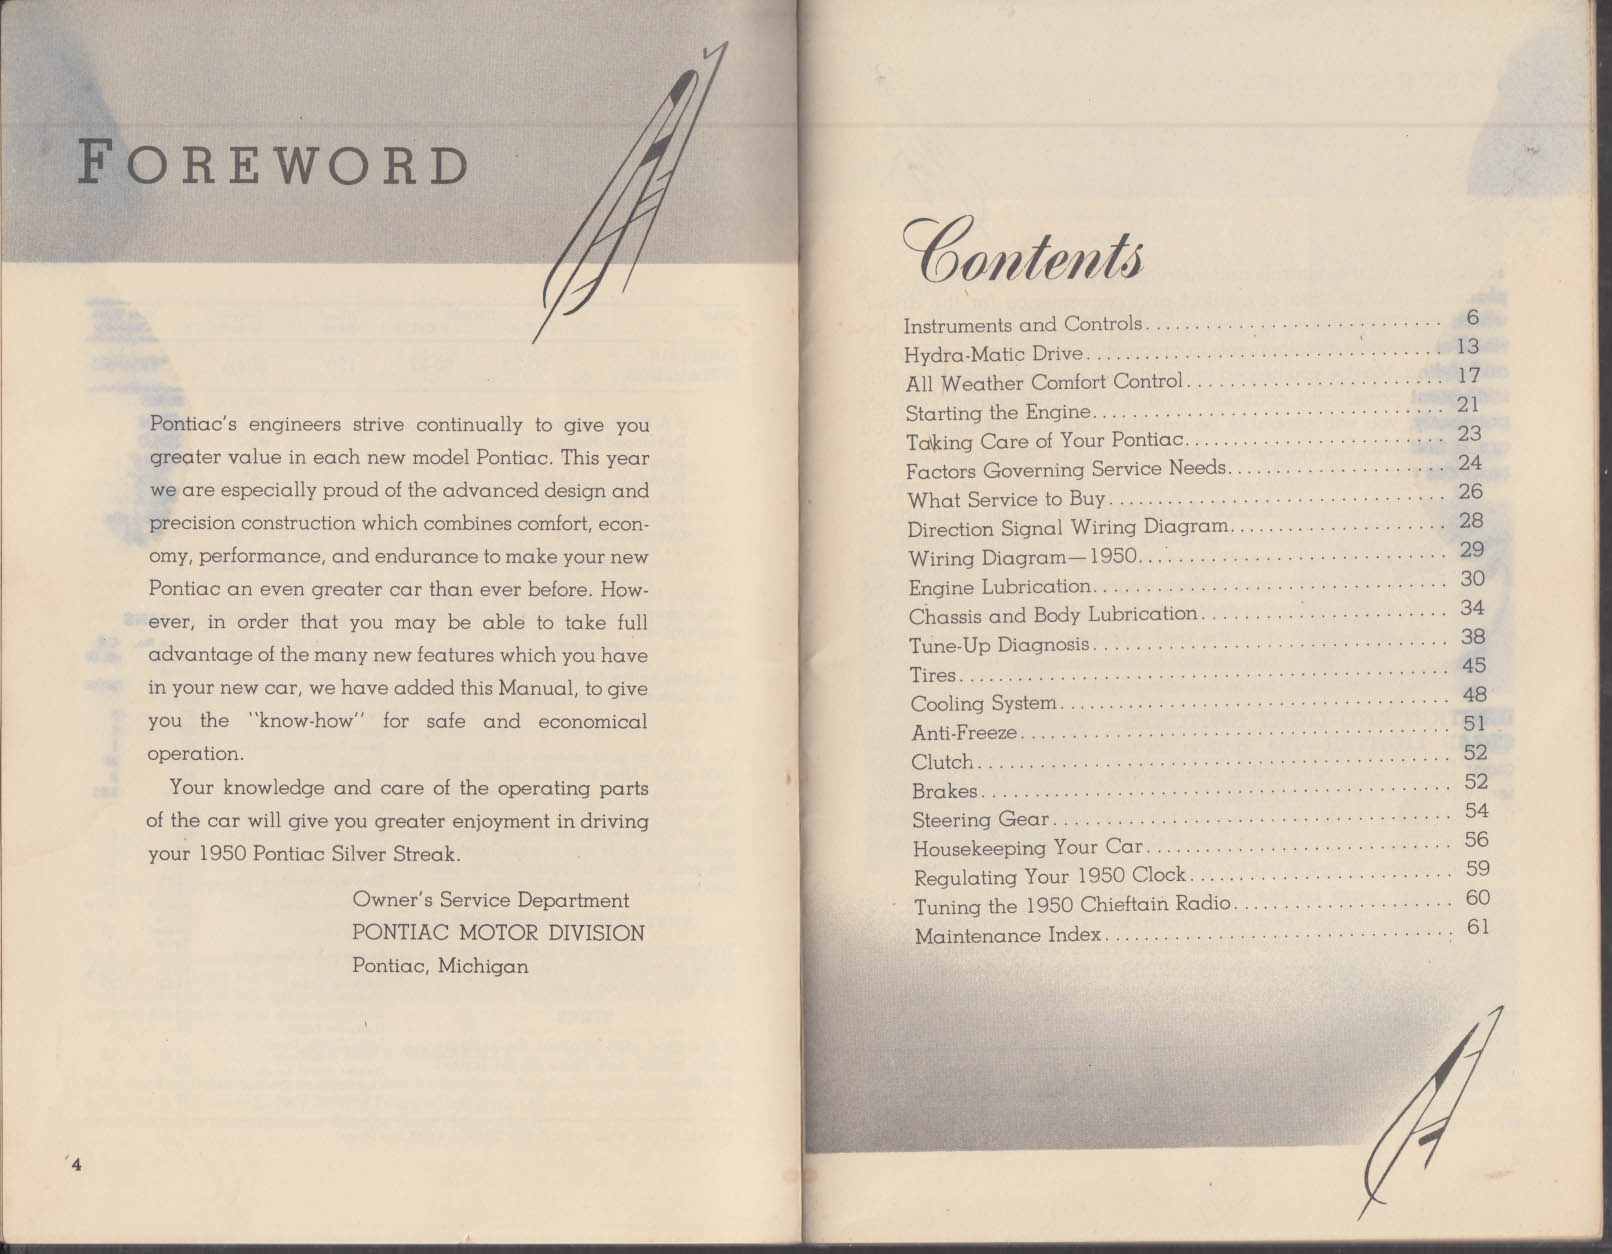 1950 Pontiac Chieftain Streamliner Owner's Manual